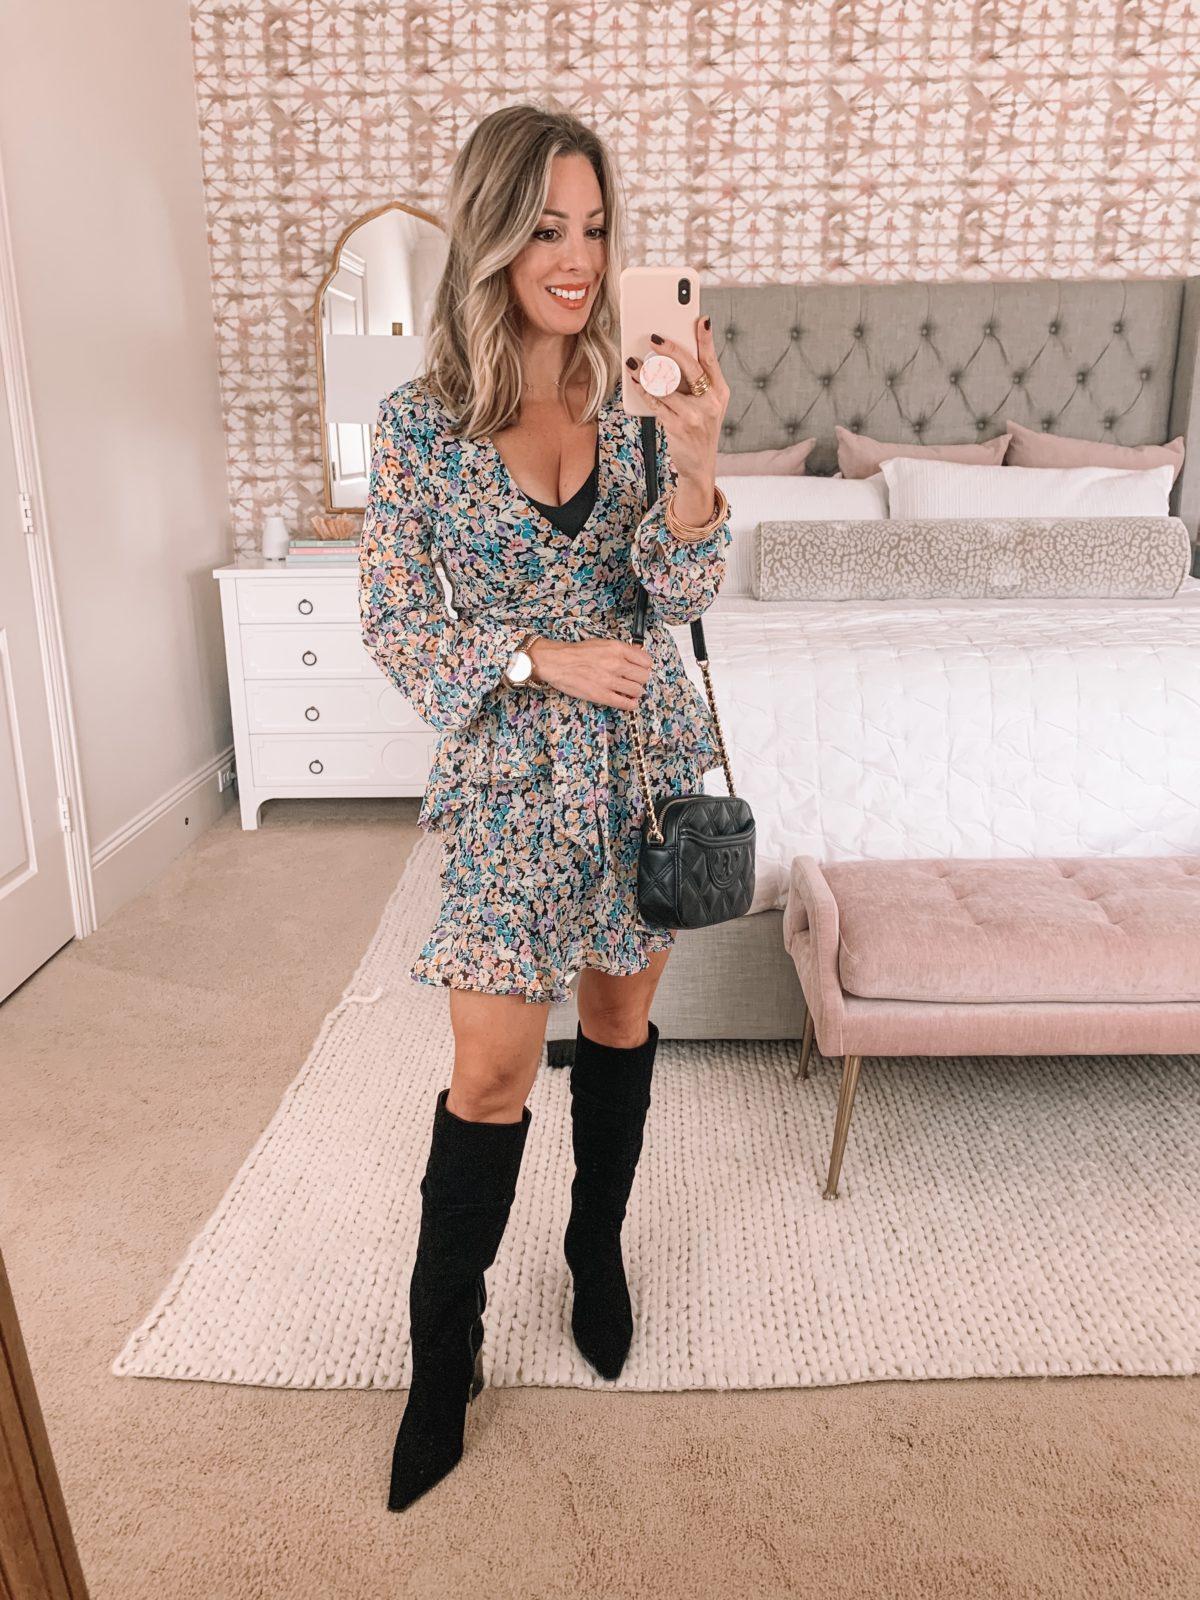 Dressing Room Finds Nordstrom, Floral Dress, Boots, Crossbody